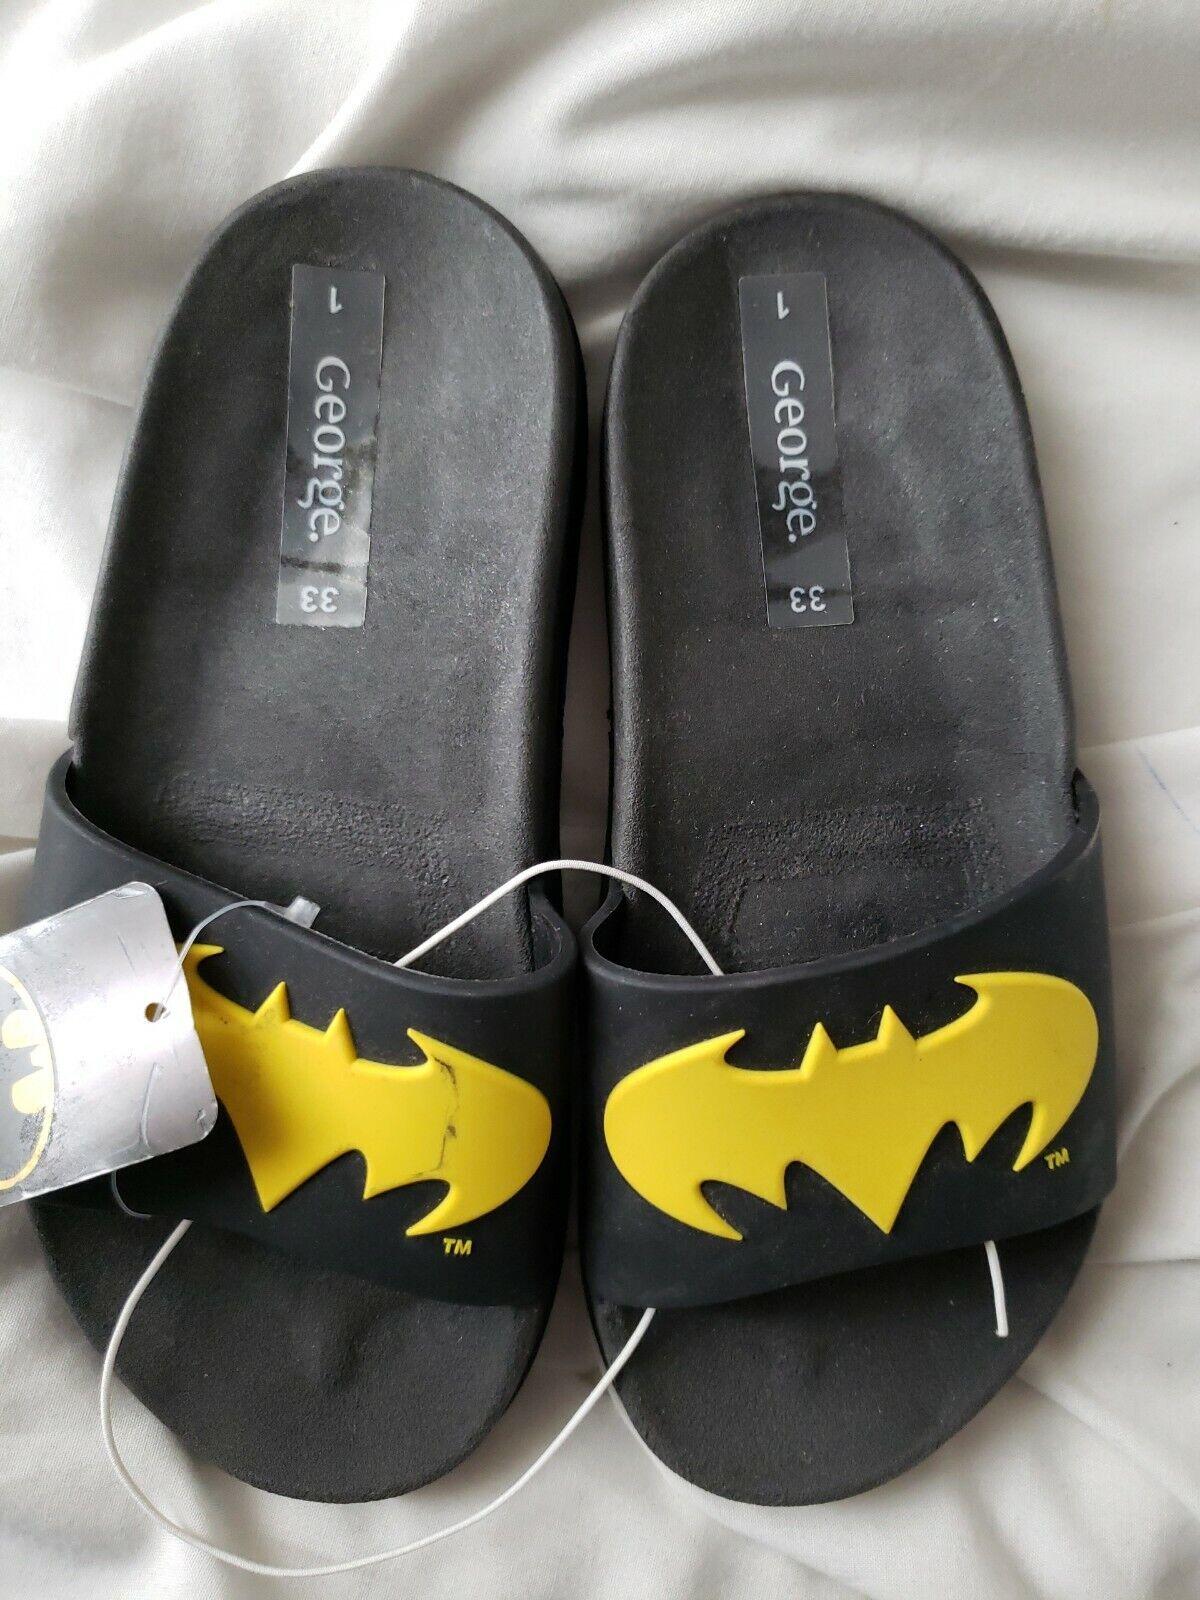 MARVEL BOYS BATMAN Slippers SIZE UK 1 euro 33 beach pool New + Tags see descrip